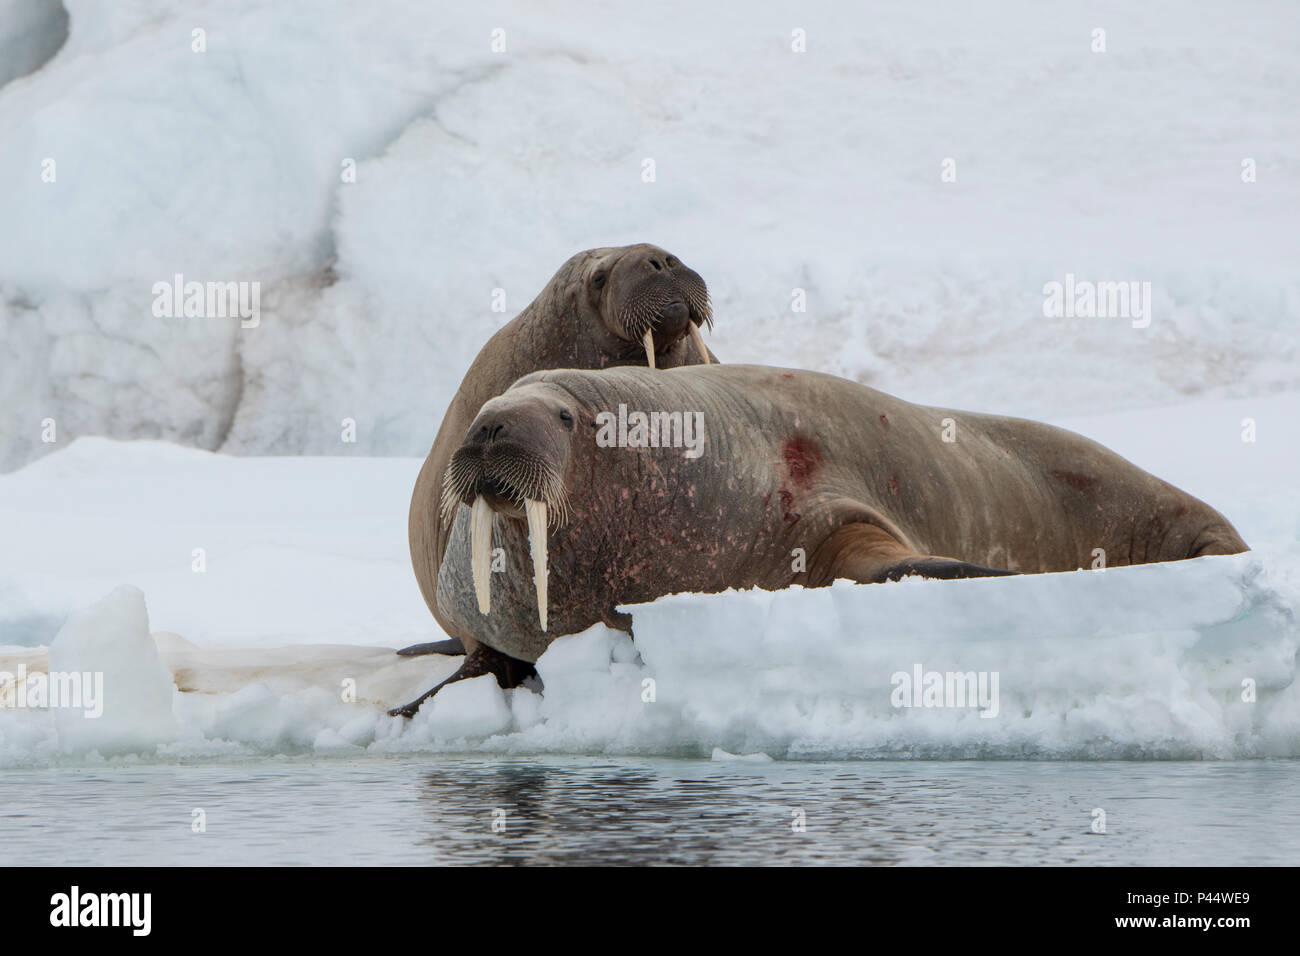 Norway, Svalbard, Nordaustlandet, Austfonna. Walrus (Odobenus rosmarus) on ice. Stock Photo